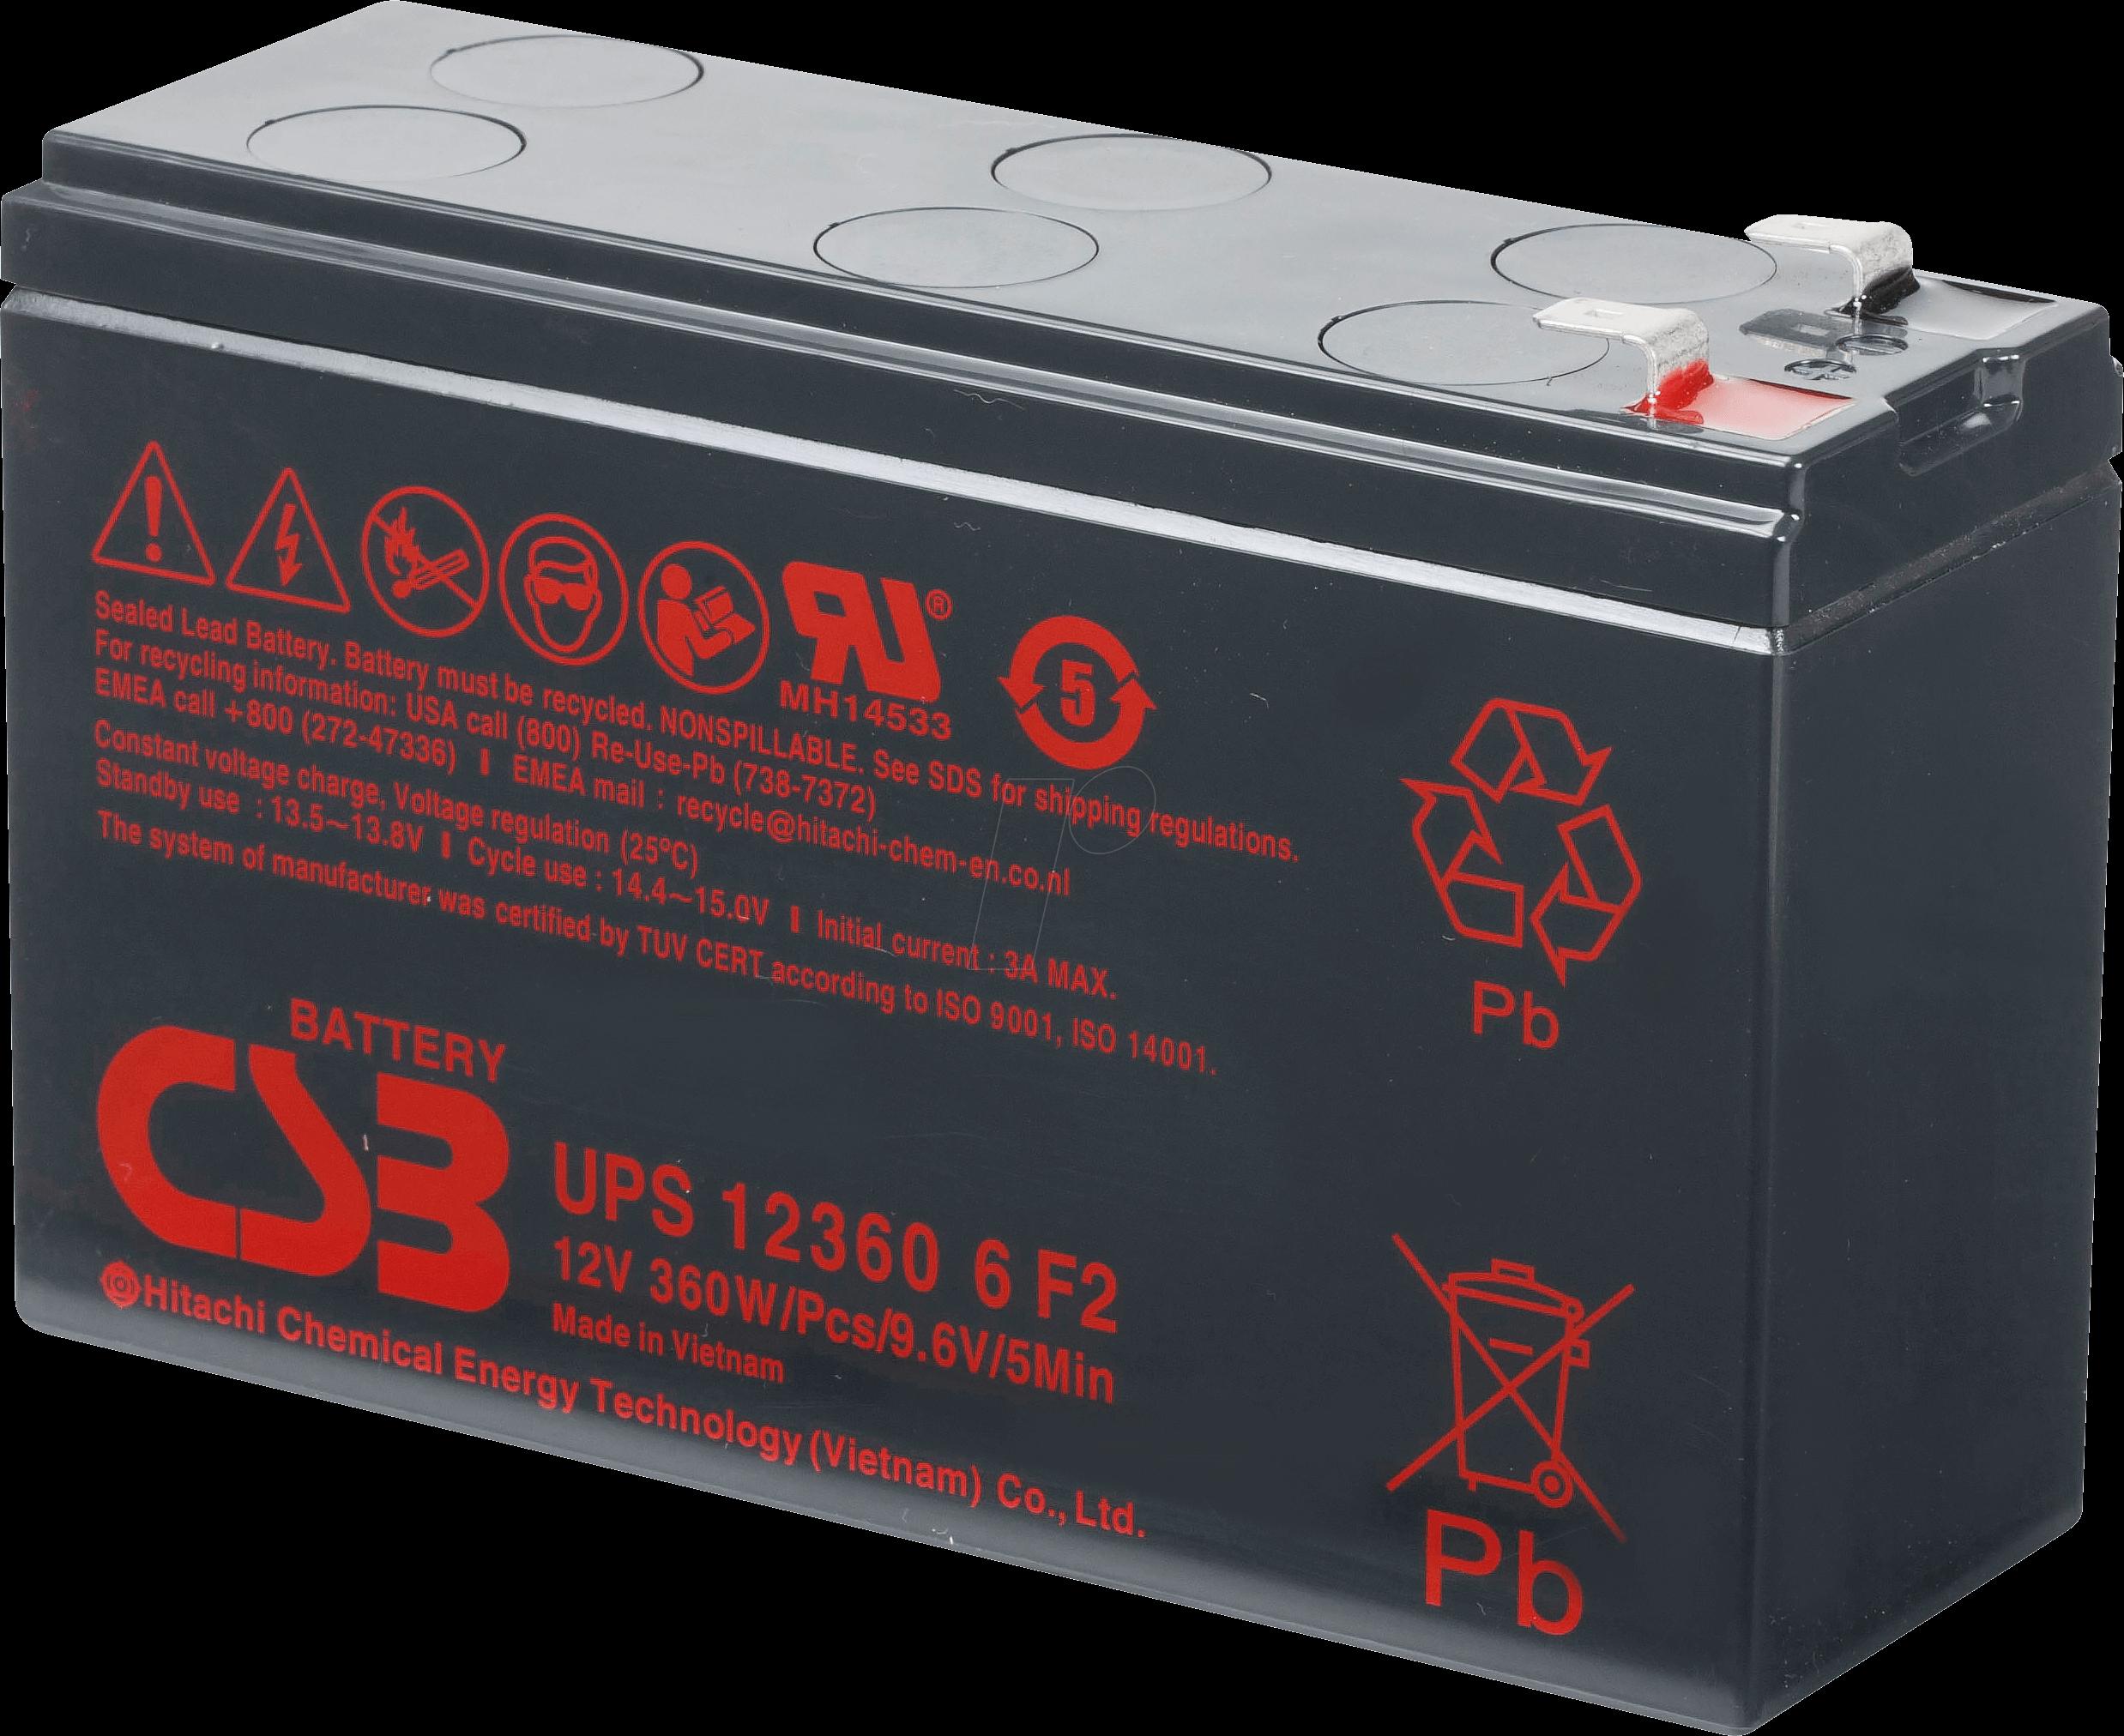 Lead Acid Battery >> Csb Ups123606 Maintenance Free Lead Acid Battery 12 V 7 Ah